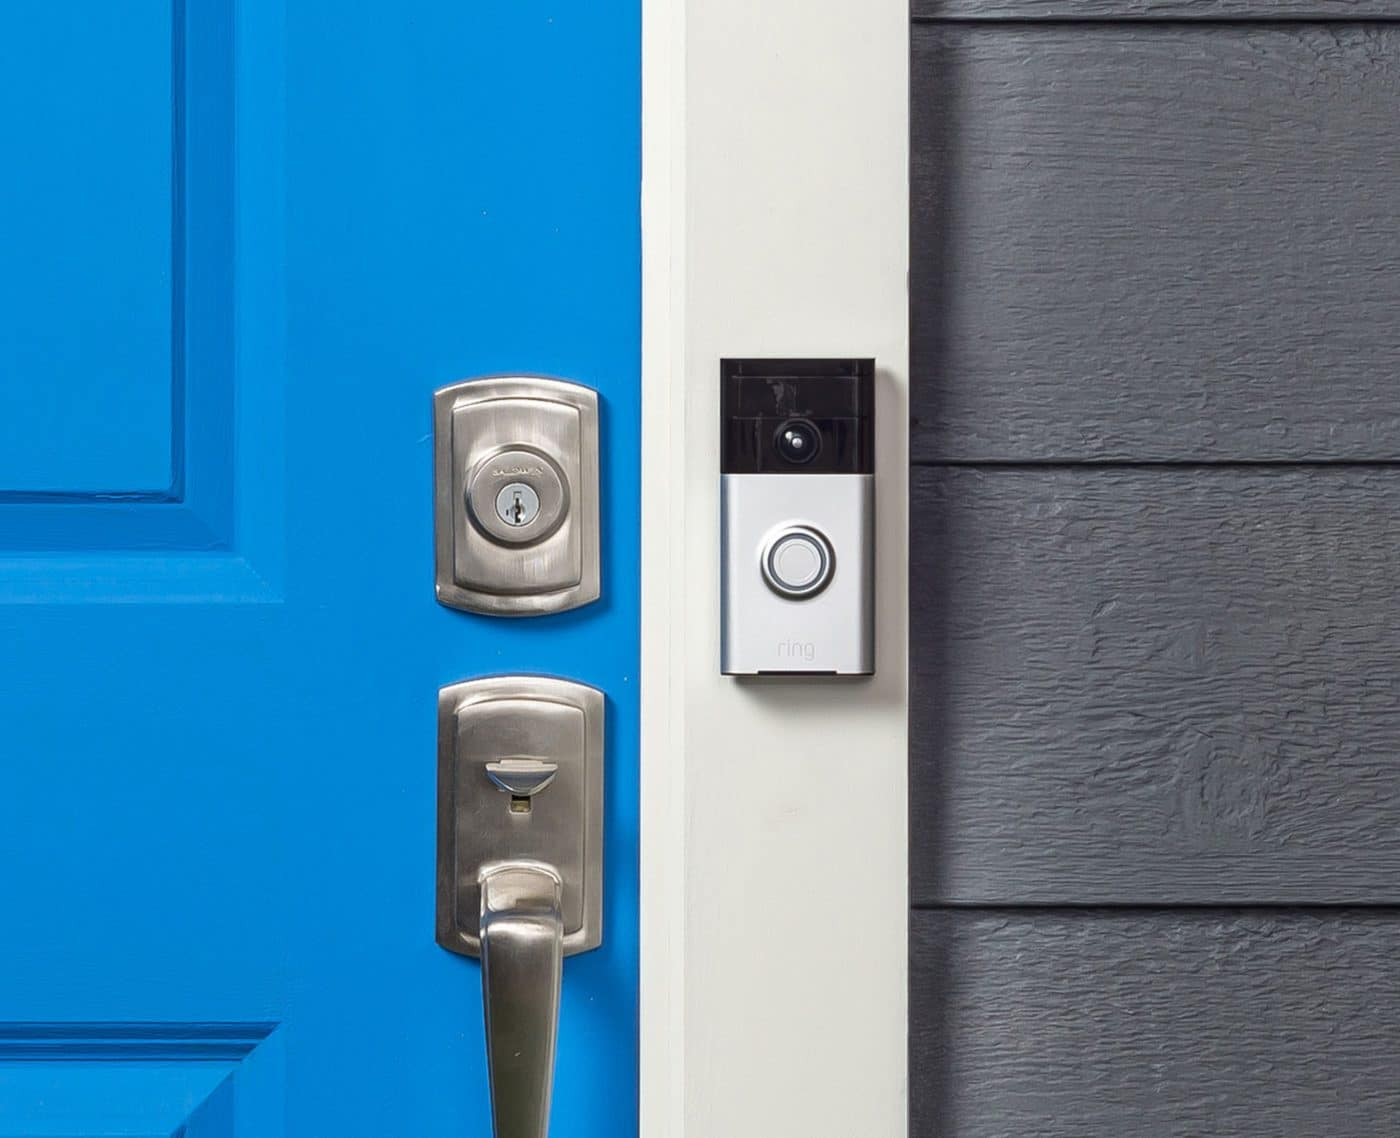 1 Secure Access Control Security